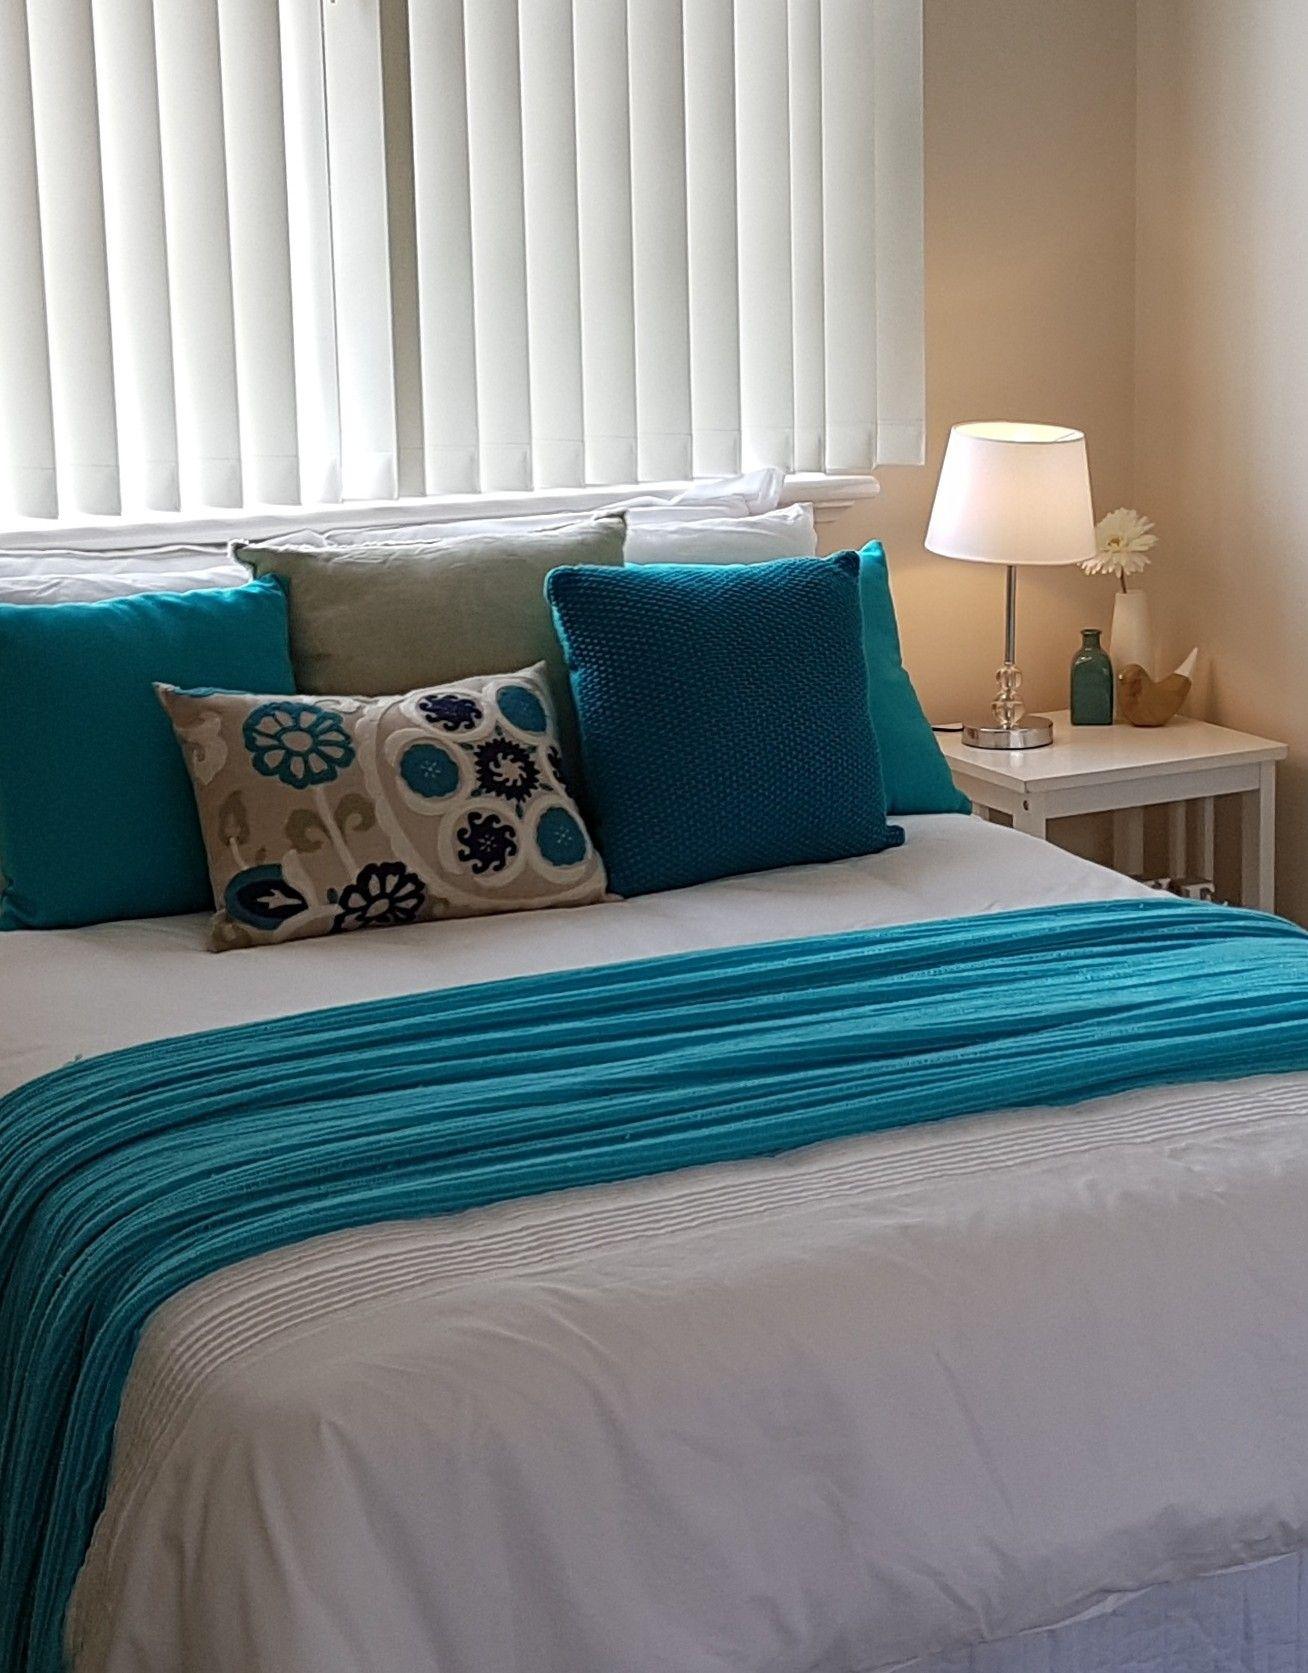 Master bedroom teal on white. Home staging, Master